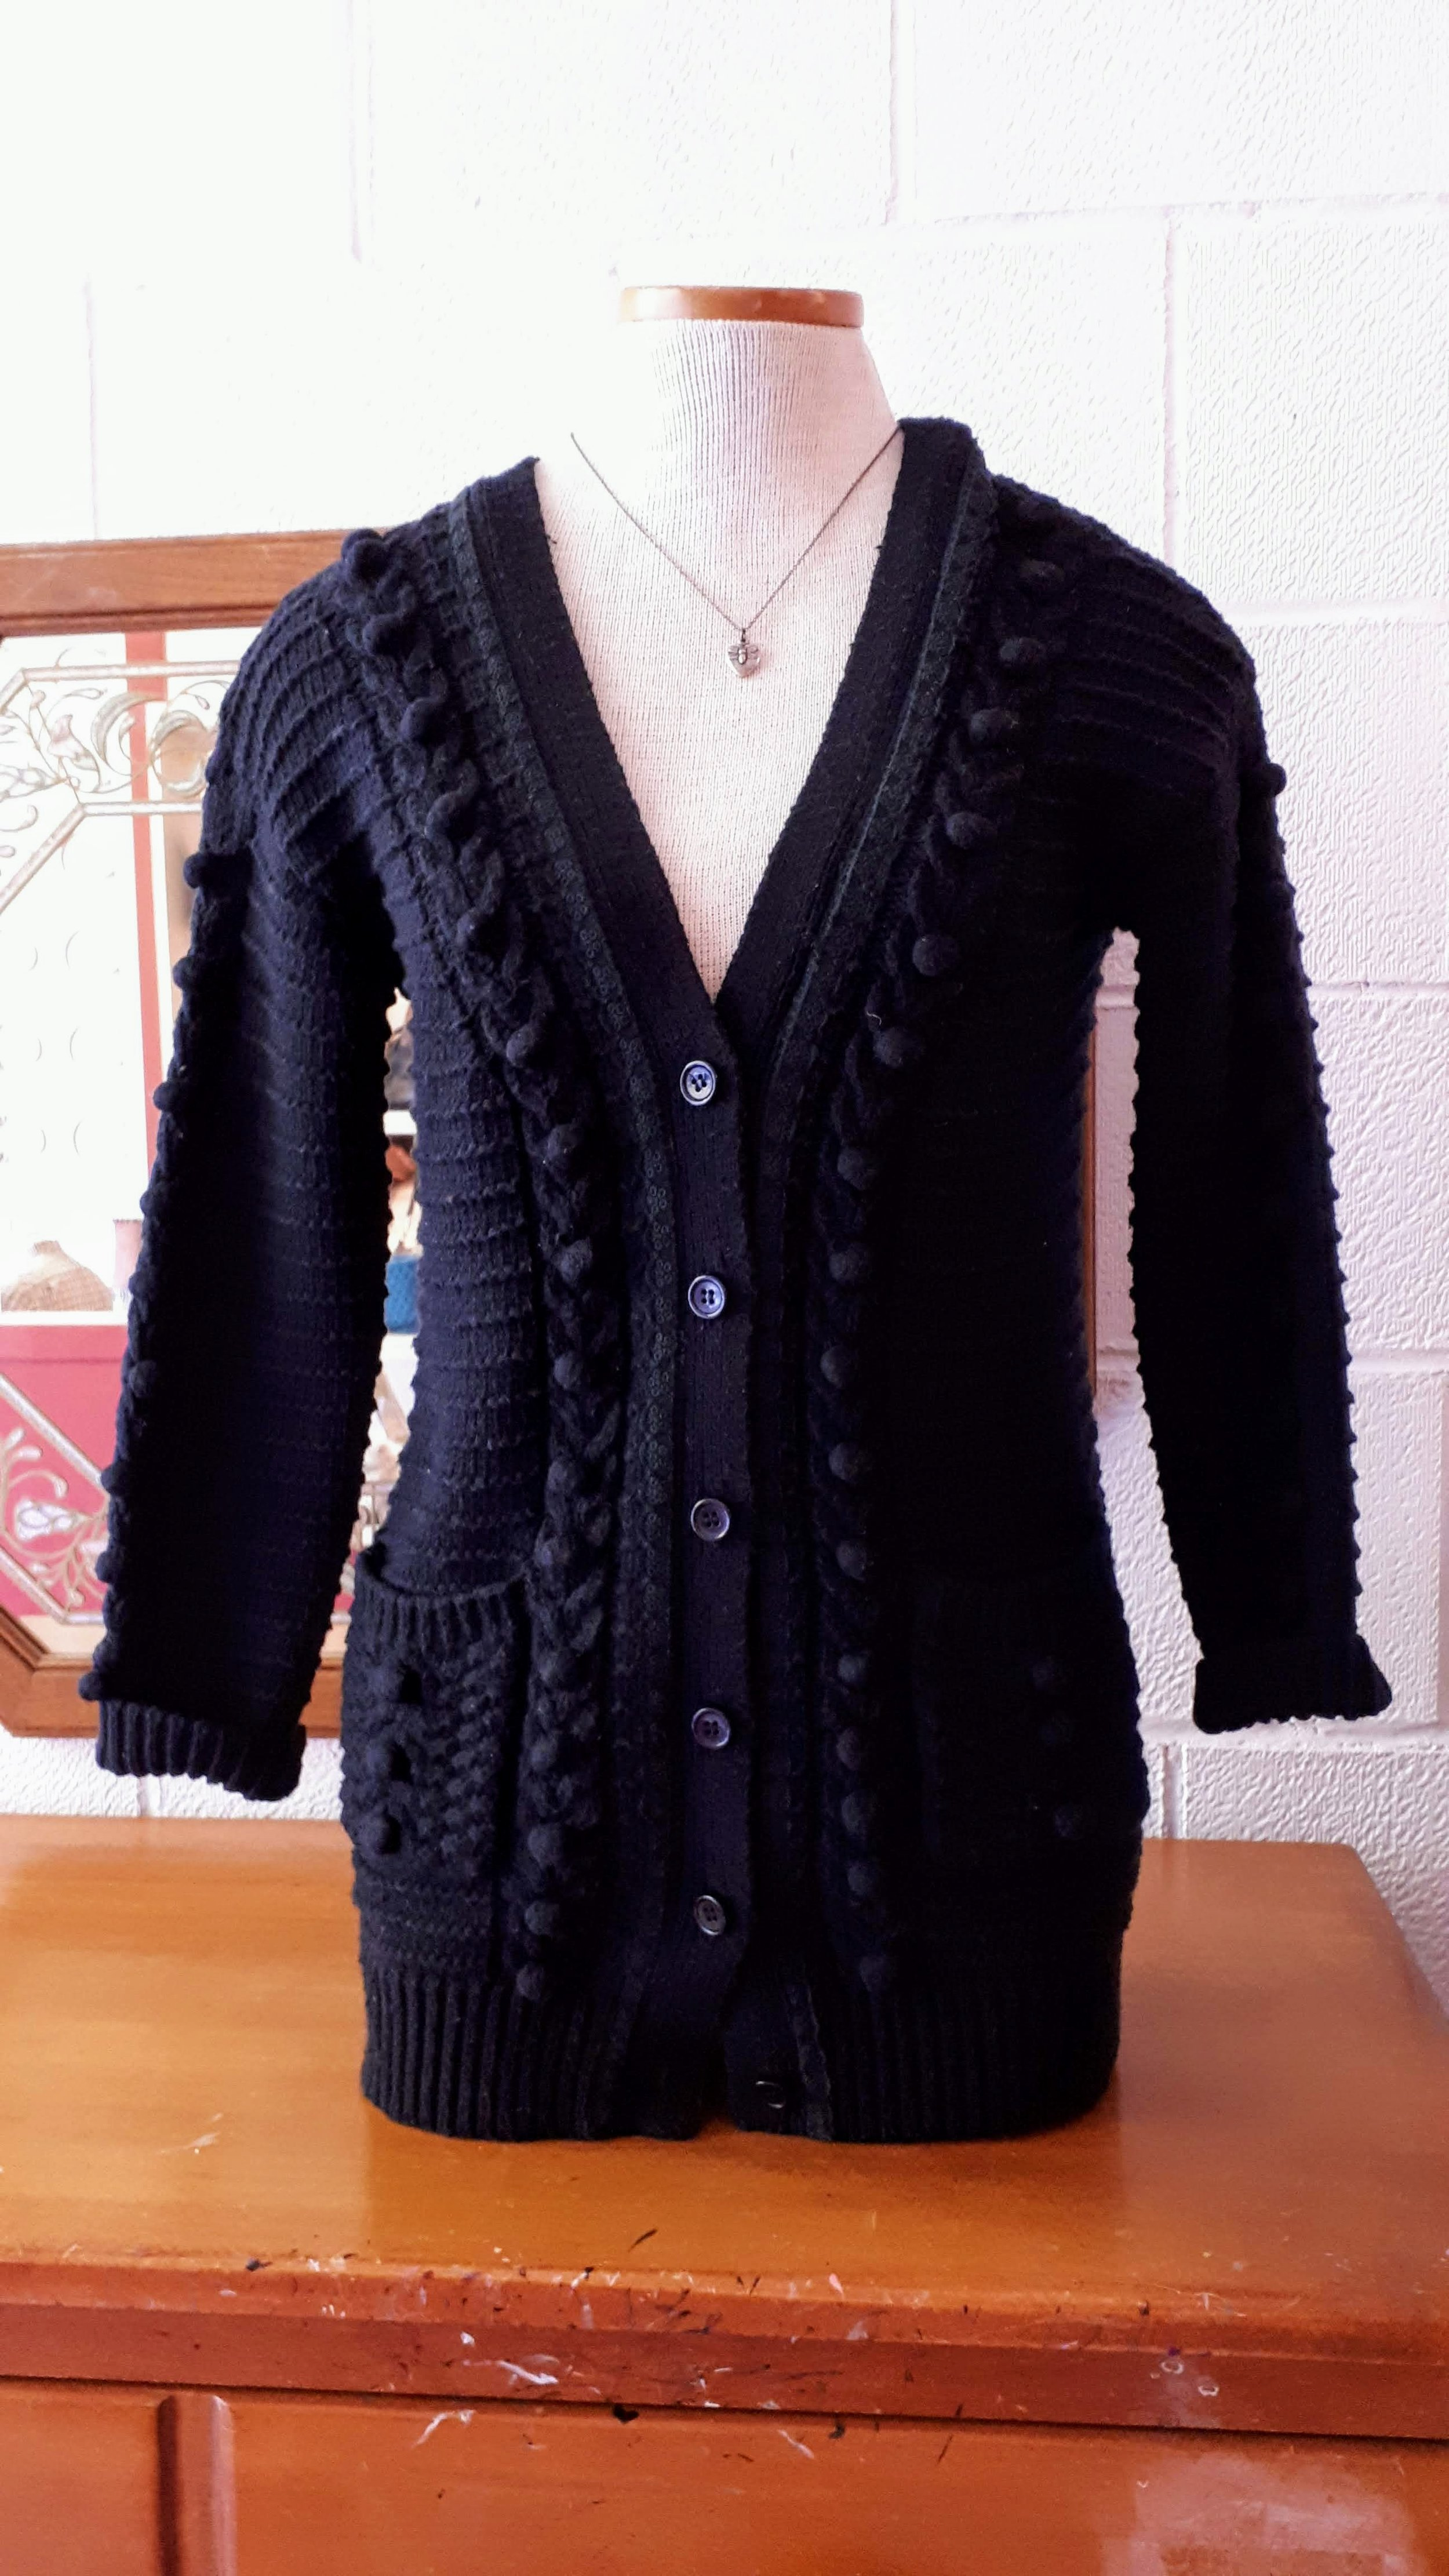 Yumi top; Size M, $42